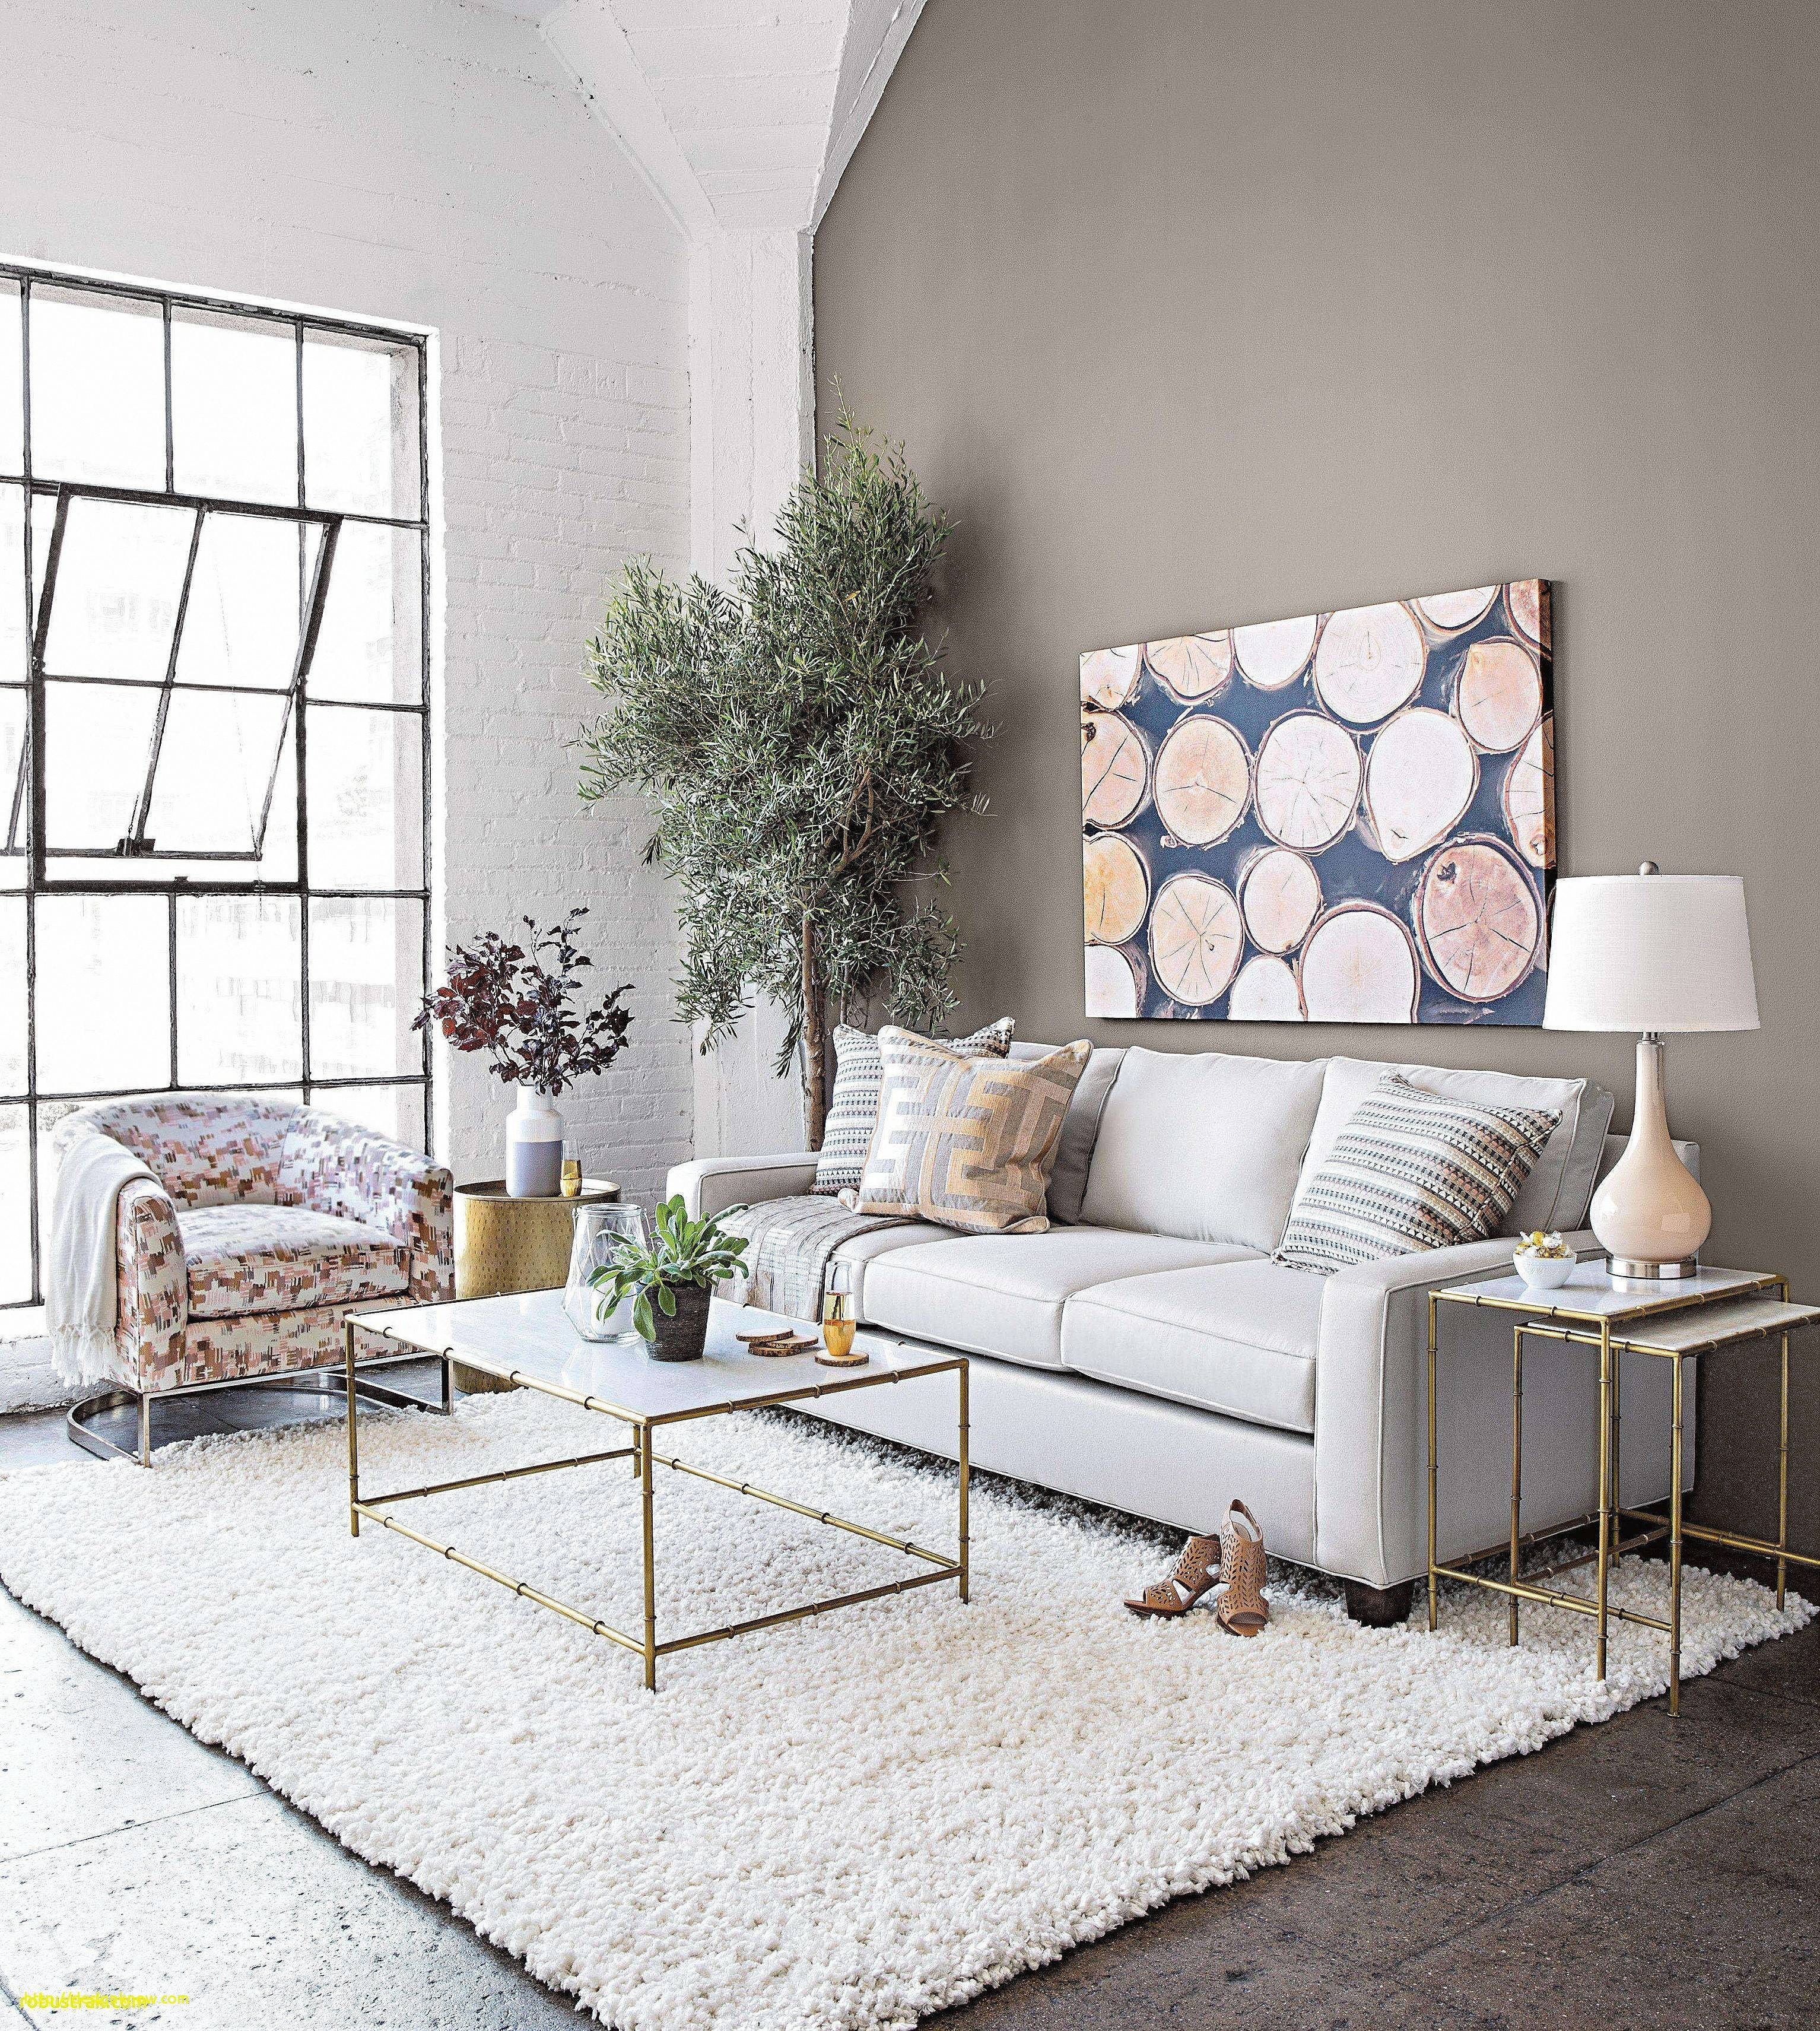 luxury interior design for small apartments unique luxury interior design ideas for living rooms of luxury interior design for small apartments